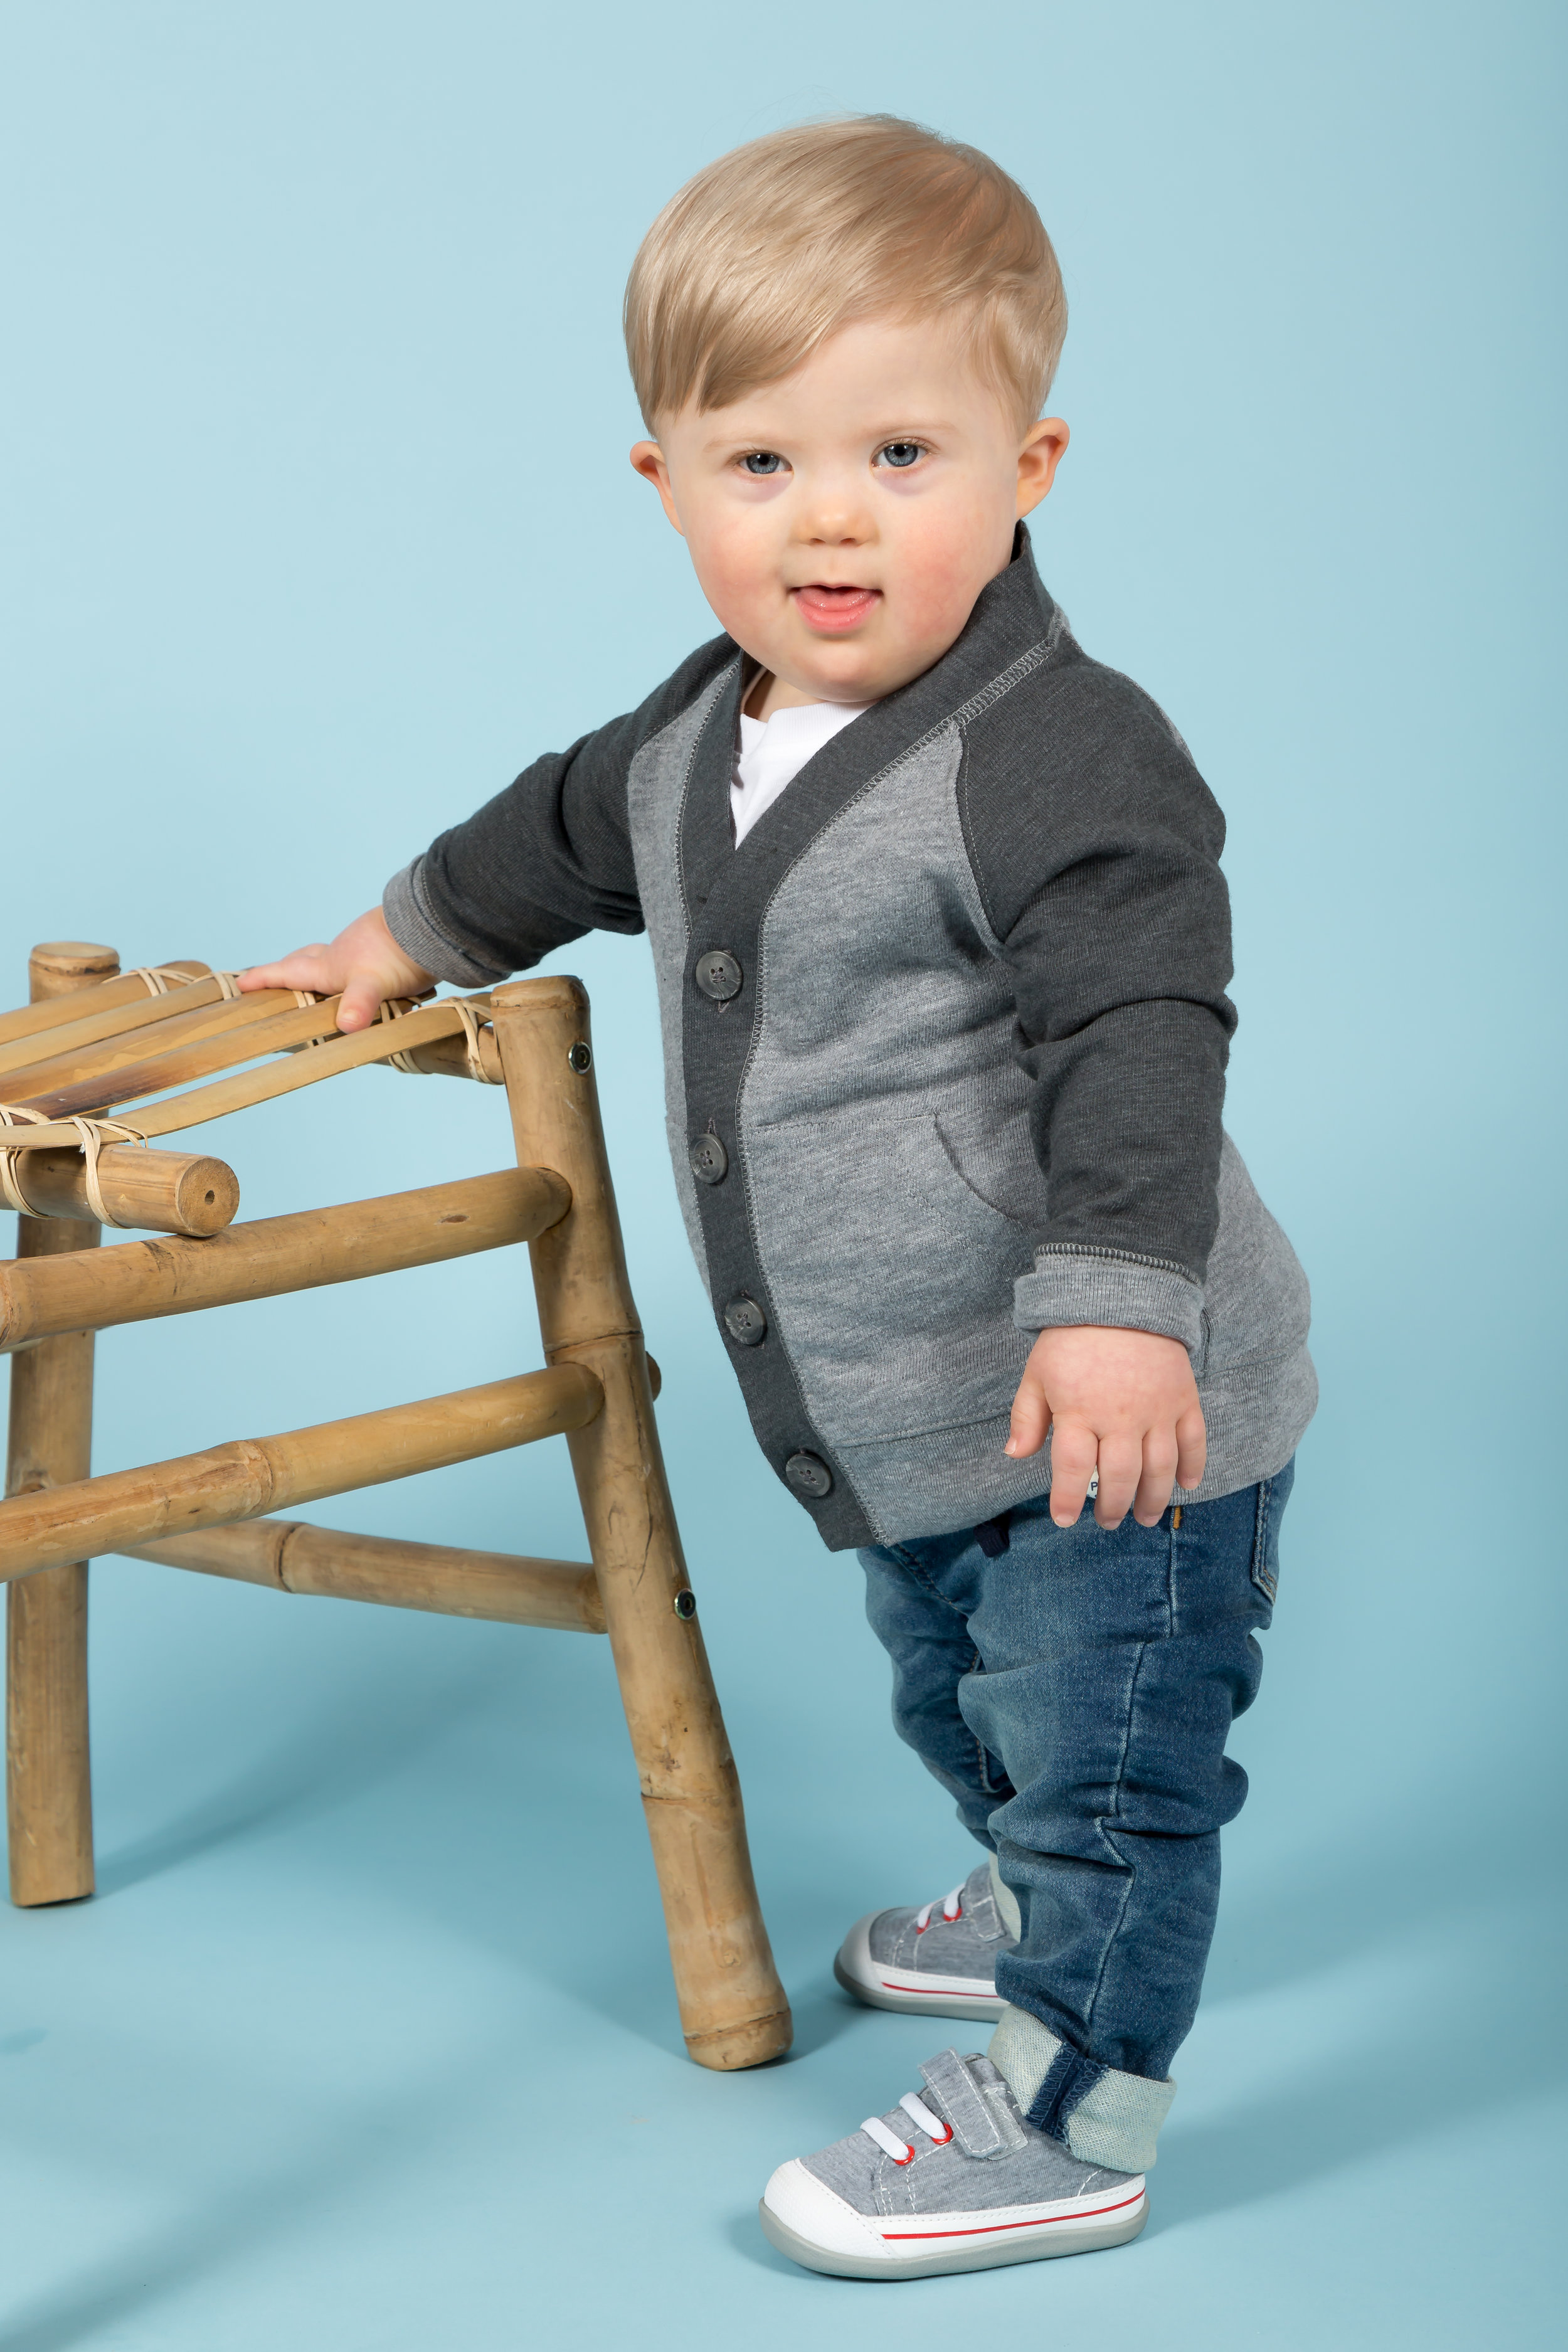 portland-or-vancouver-wa-baby-toddler-portfolio-portrait-photos